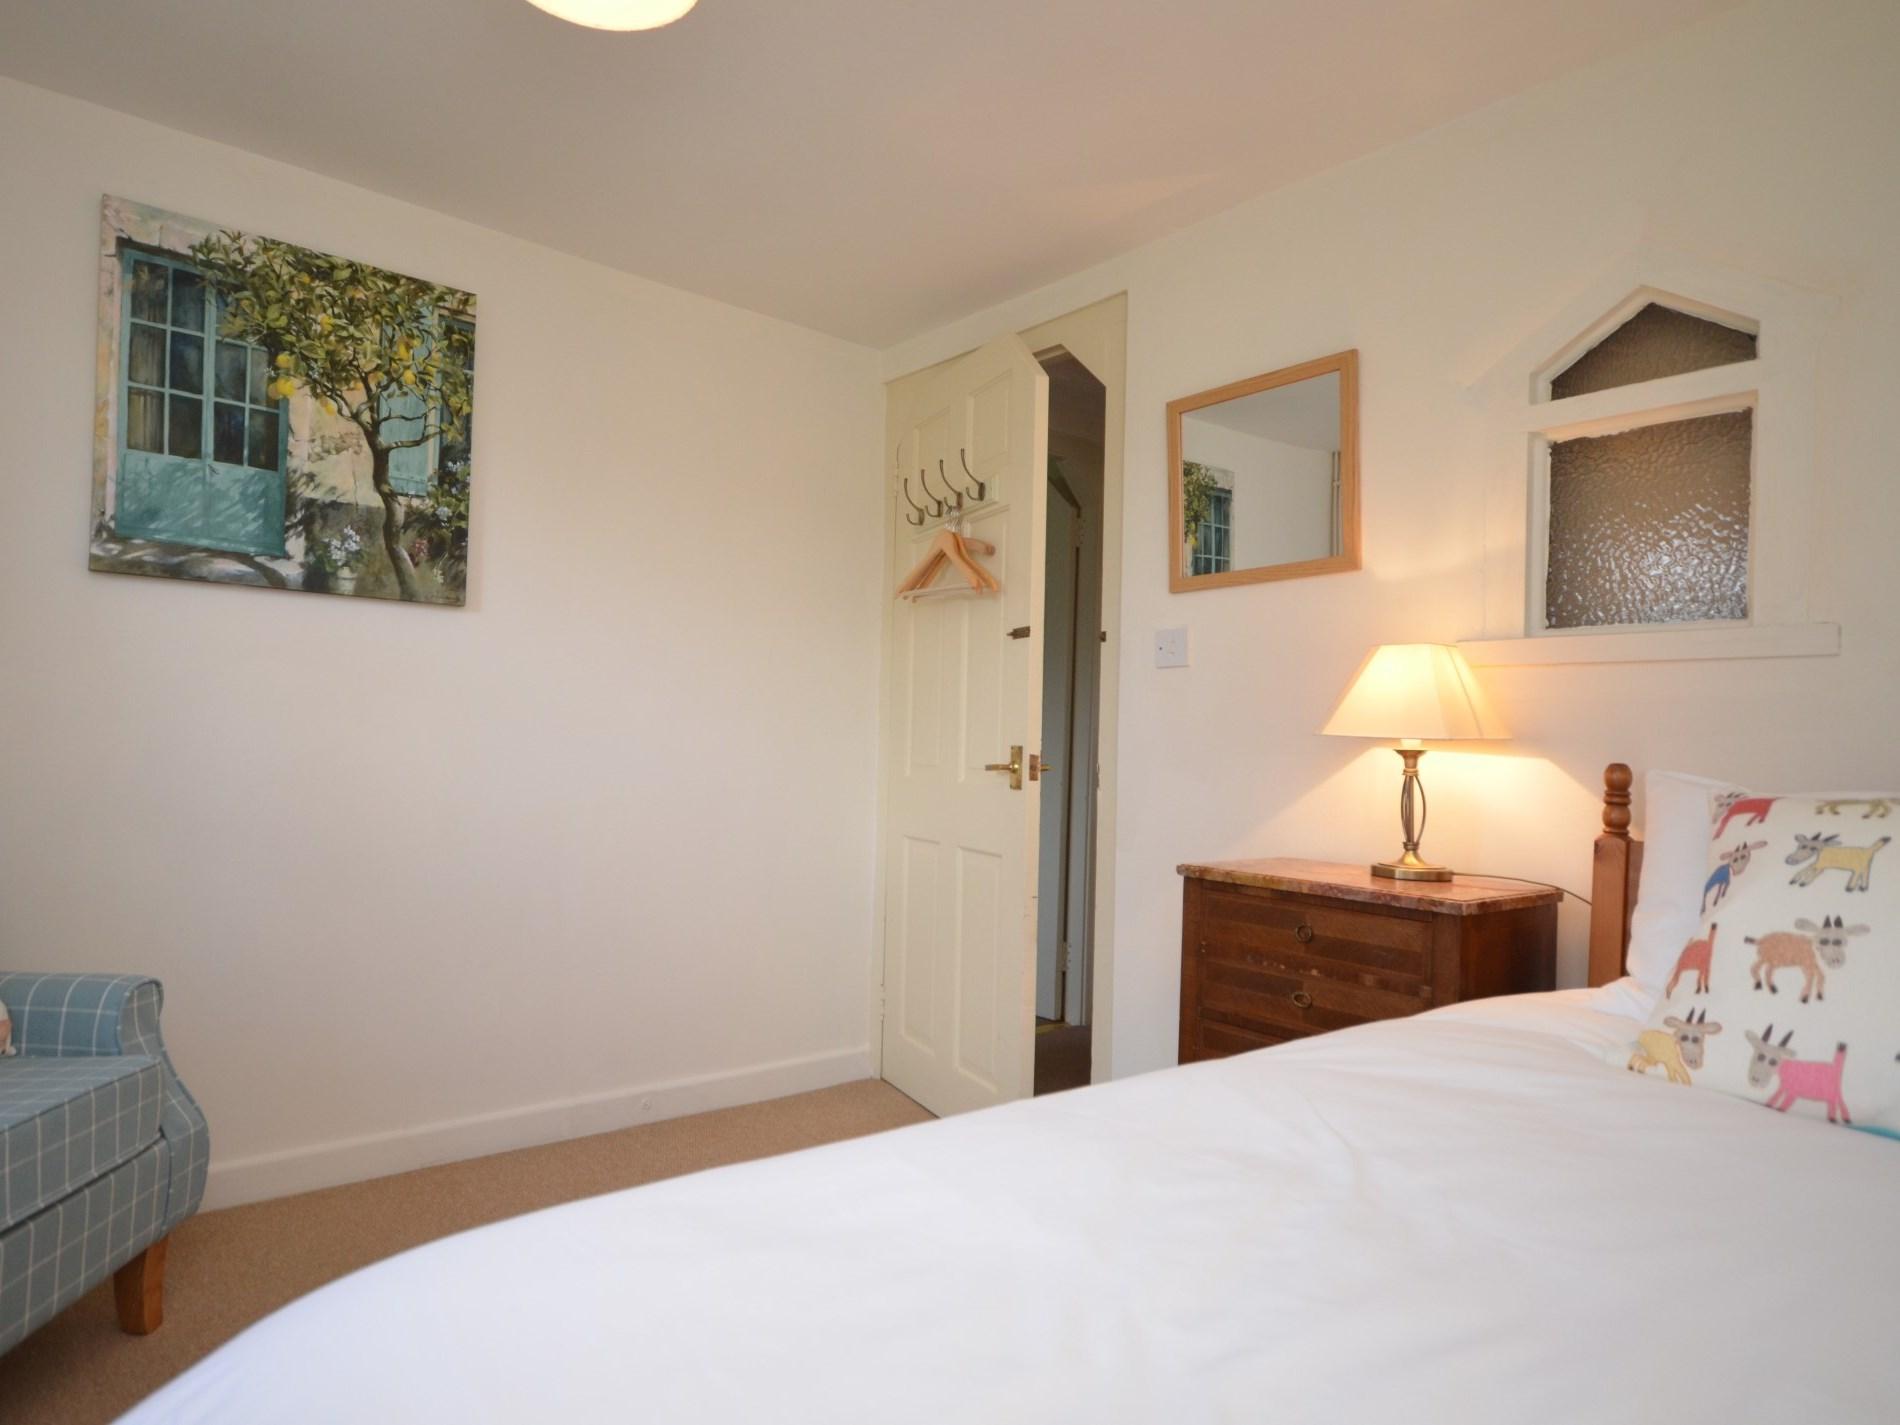 6 Bedroom Cottage in Honiton, Devon